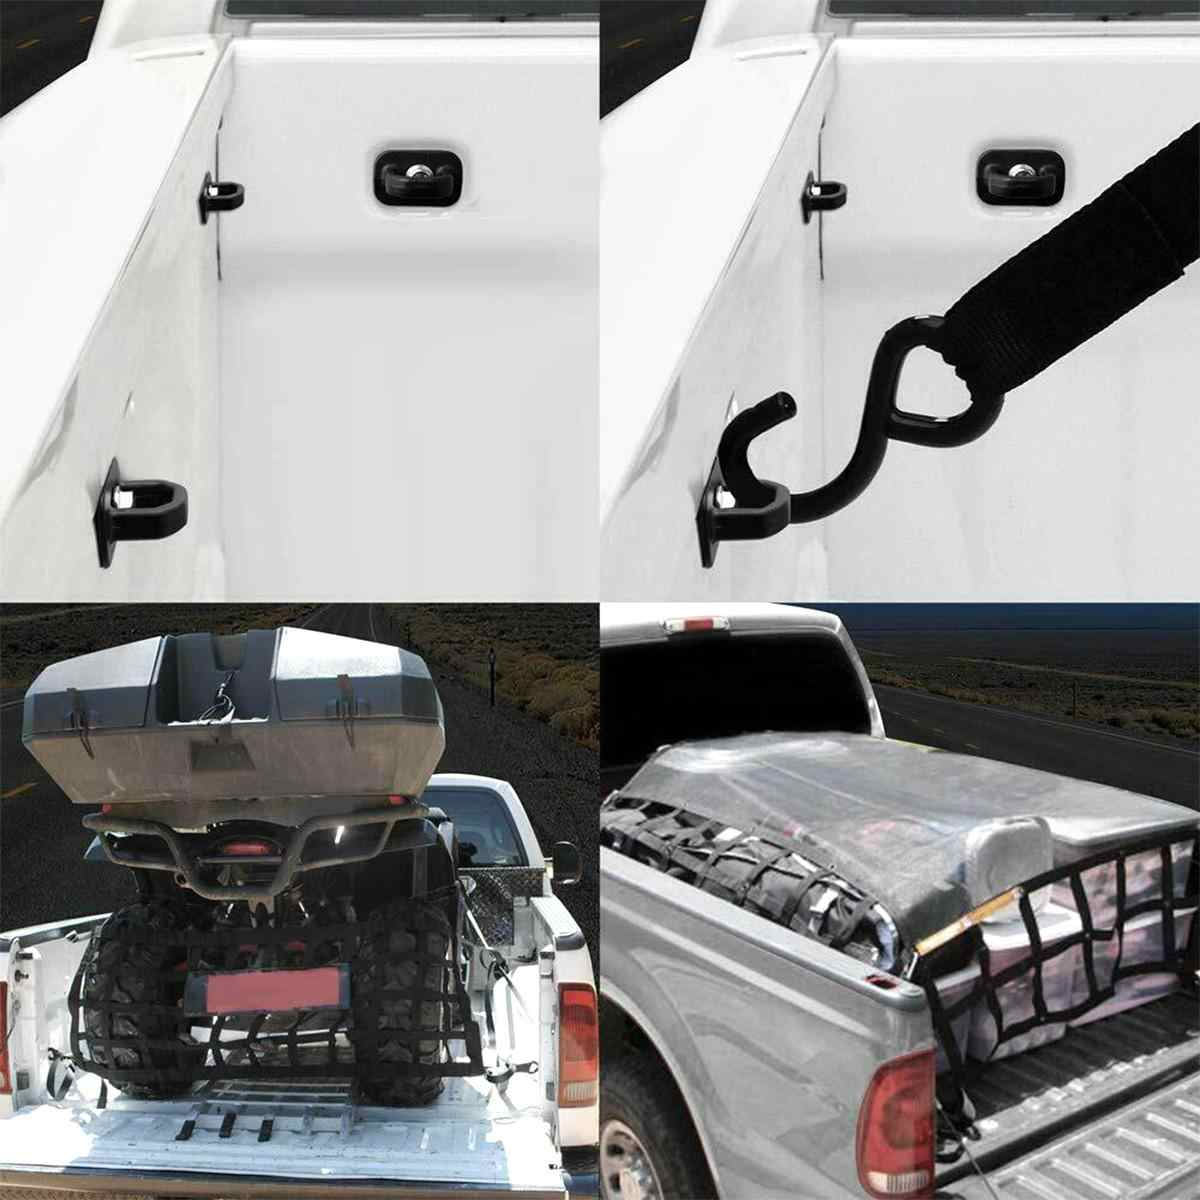 WMPHE Compatible with 4PCS Tie Down Anchors Truck Cargo Fixed Wall Anchor Chevrolet Colorado 15-18,GMC Canyon 15-18,Chevrolet Silverdo 07-18,GMC Sierra 07-18